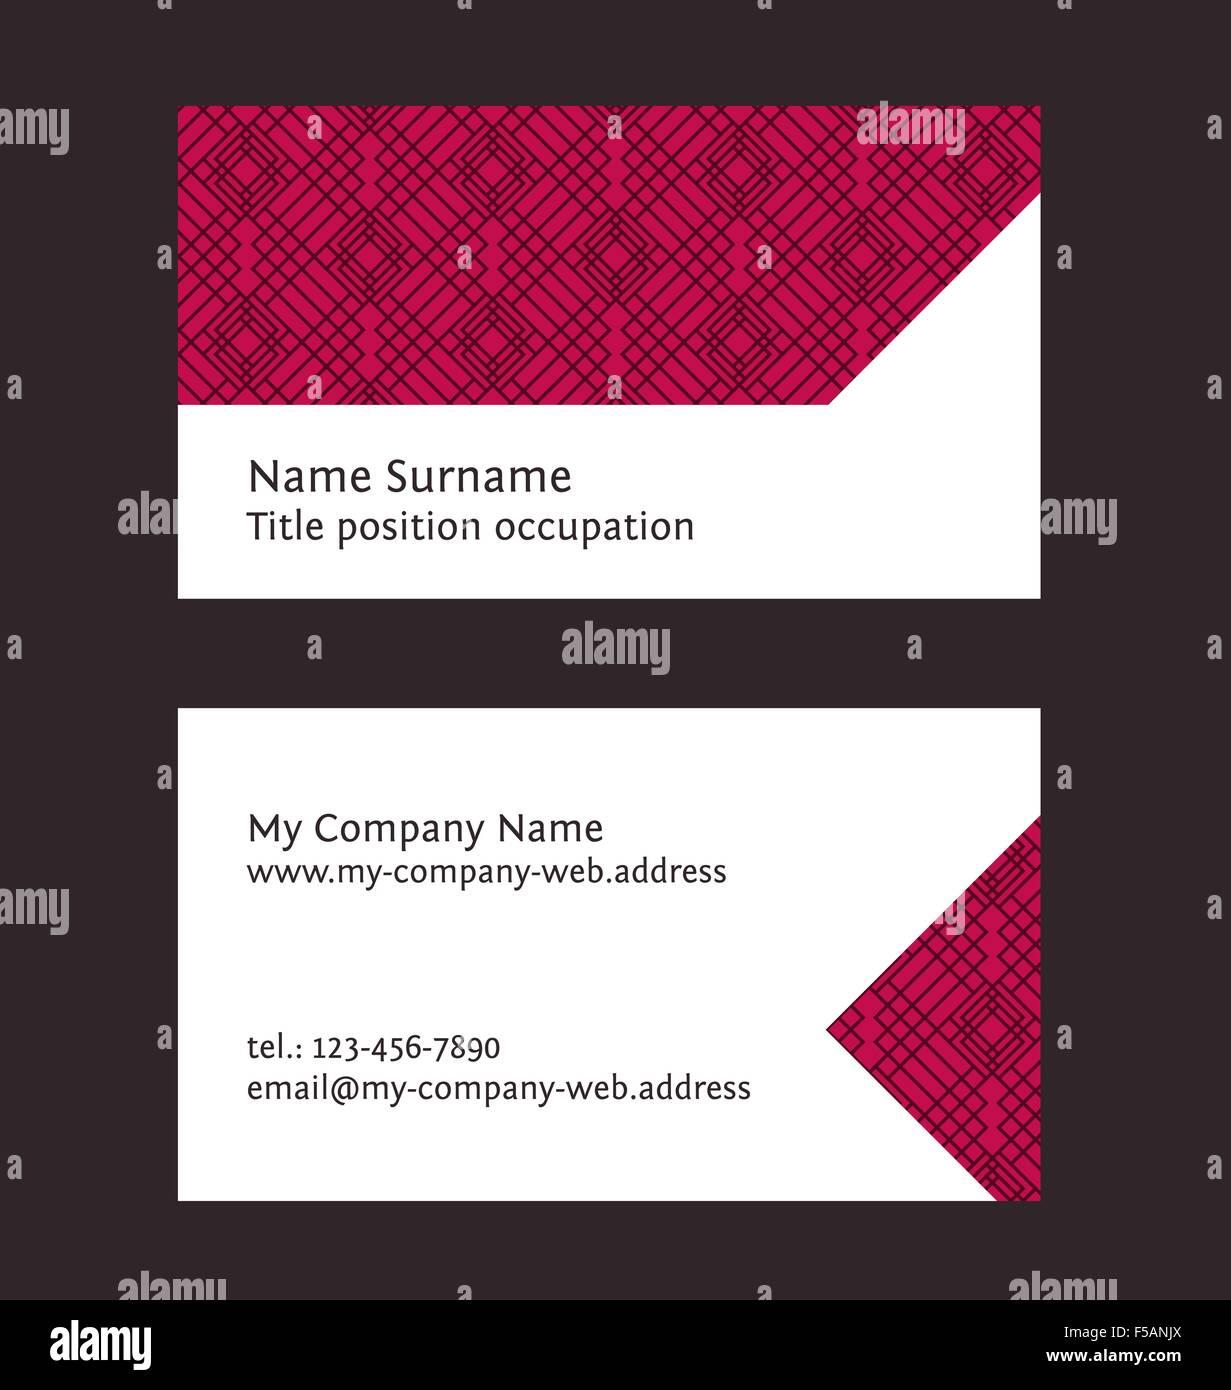 visitenkarten layout lineare geometrische muster editierbare design vorlage - Muster Visitenkarten